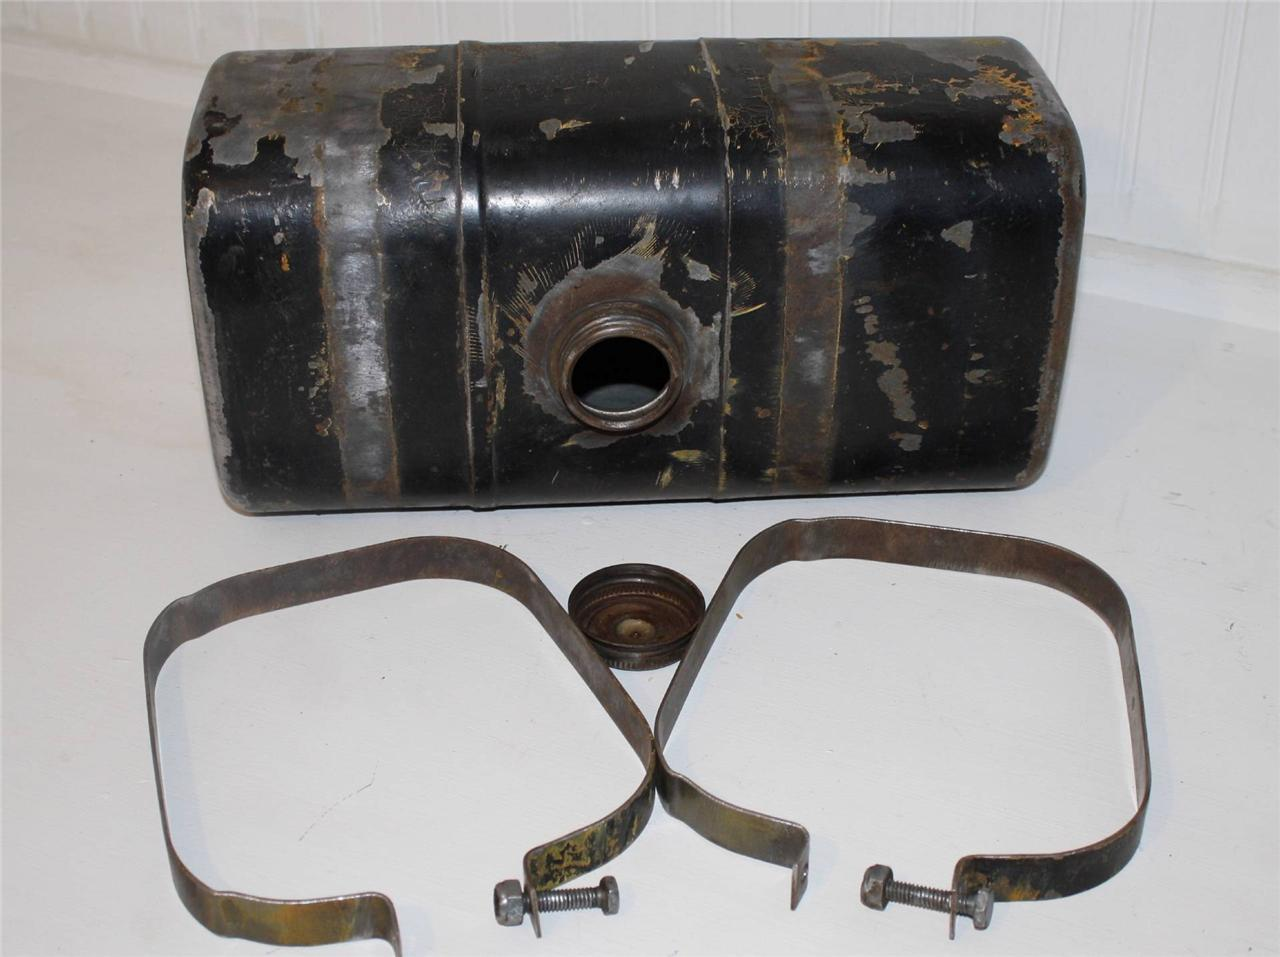 International Tractor Fuel Tanks : Ih cub cadet lawn tractor fuel gas tank w mounting straps